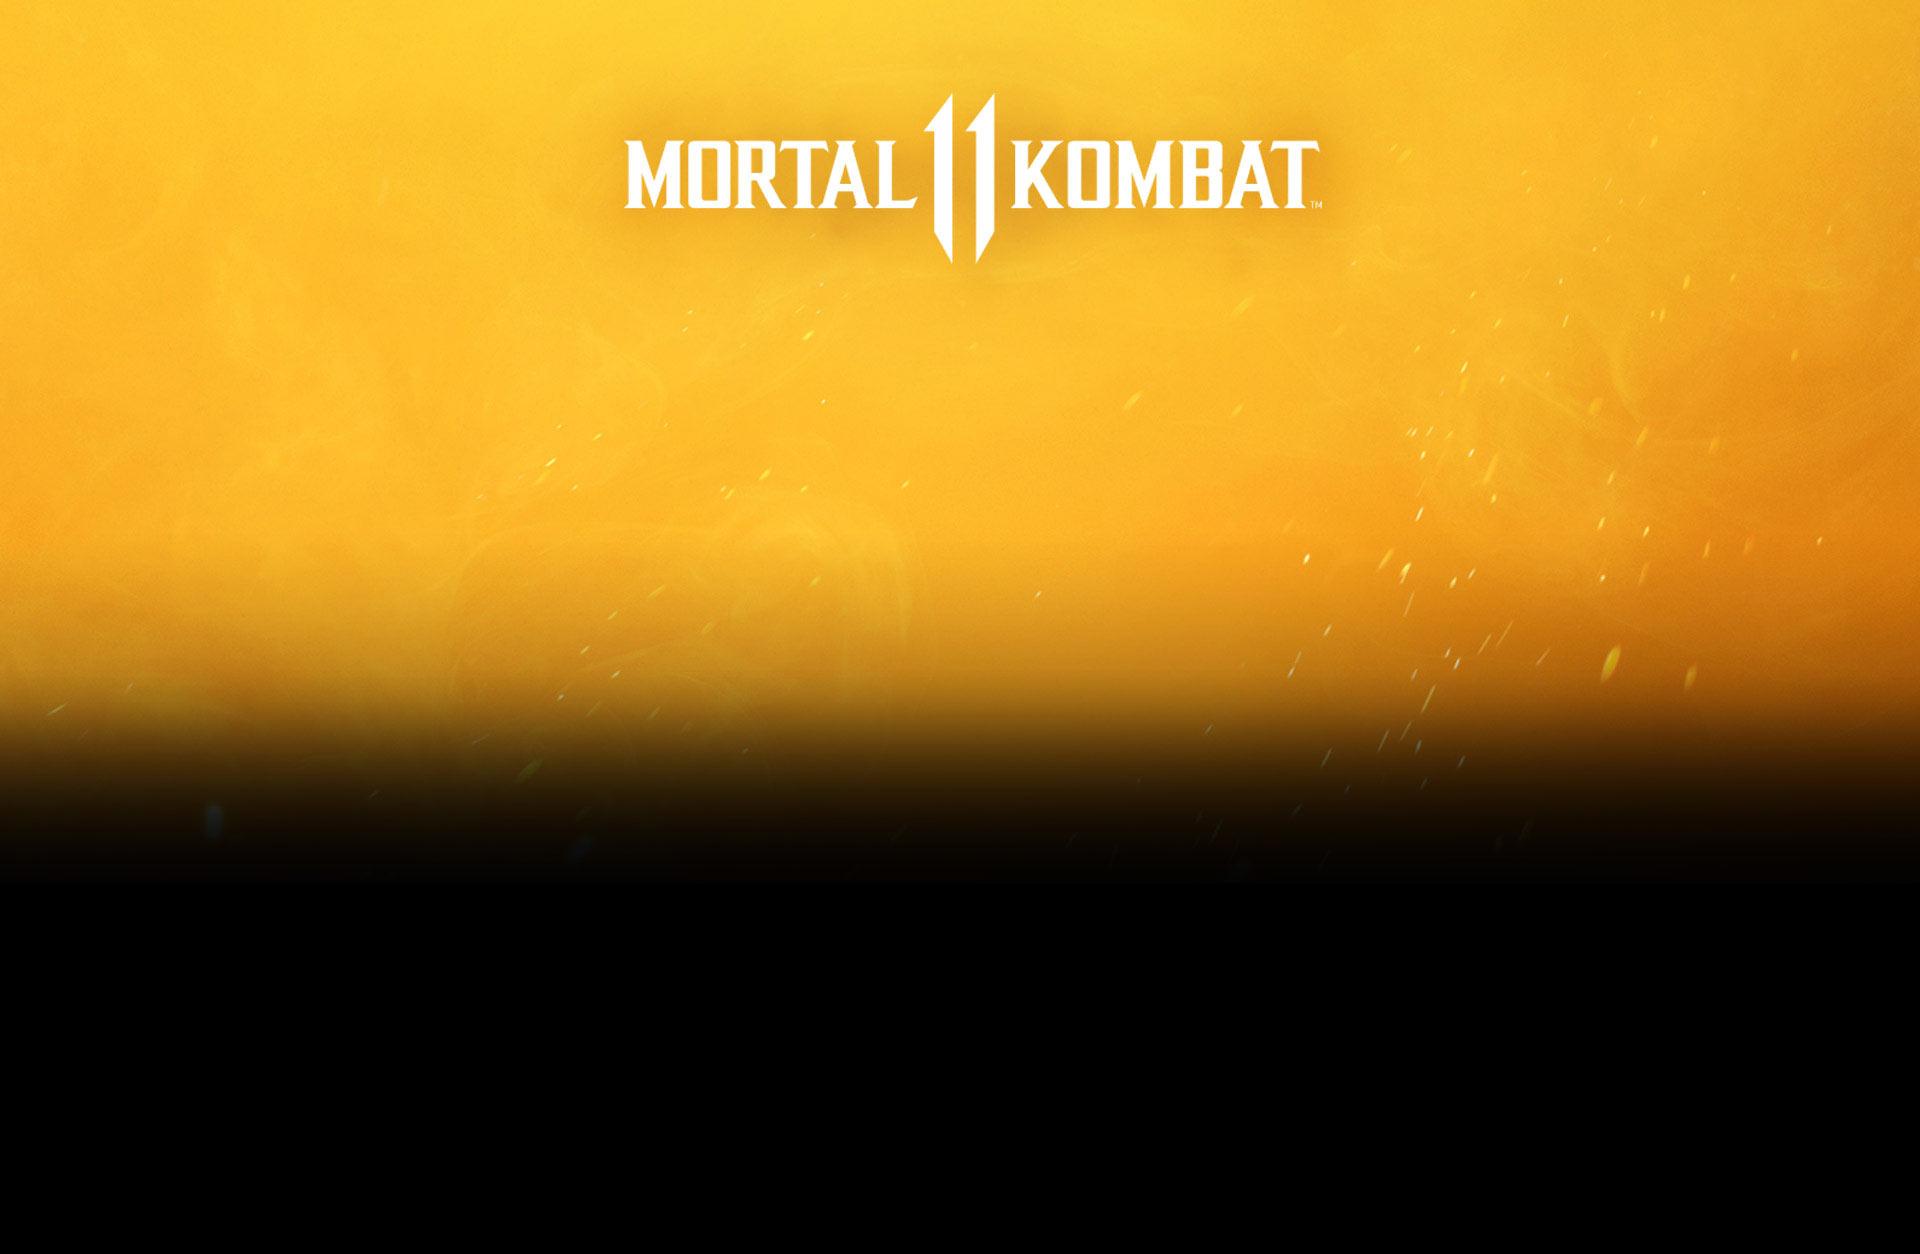 Buy Mortal Kombat 11 On Gamesload